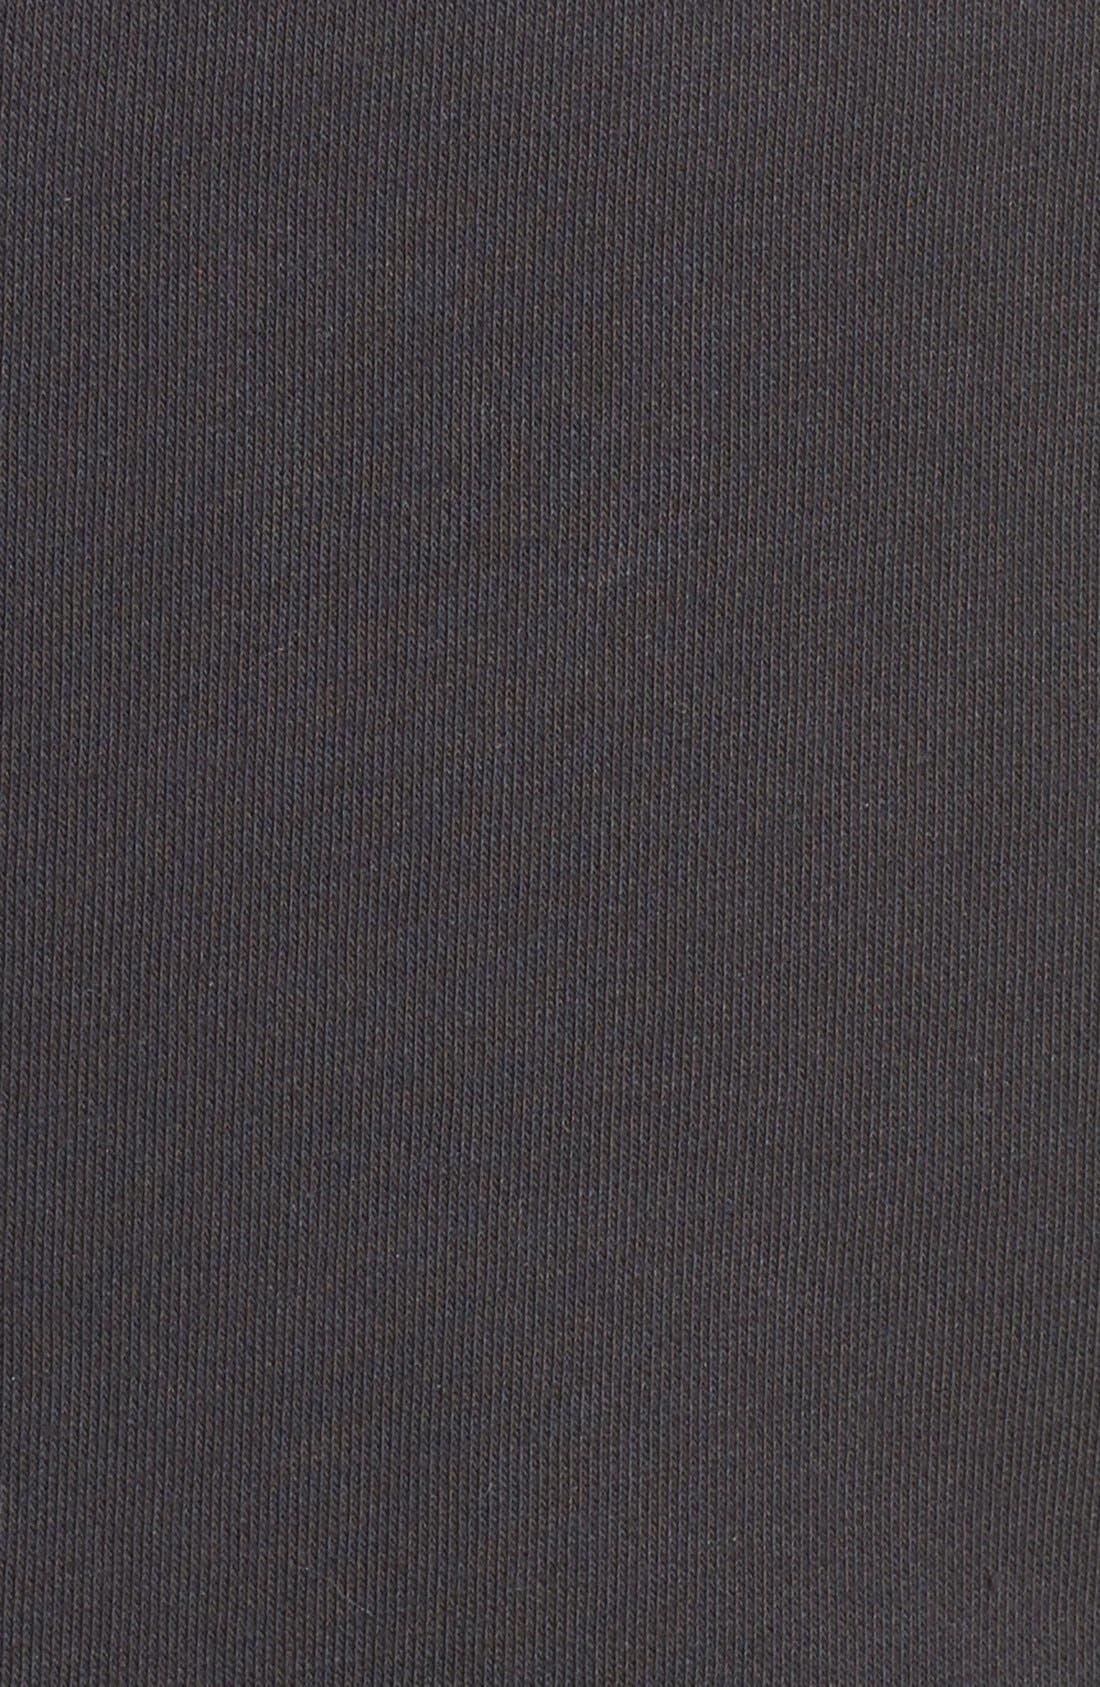 Alternate Image 5  - adidas Originals Trefoil Crewneck Sweatshirt